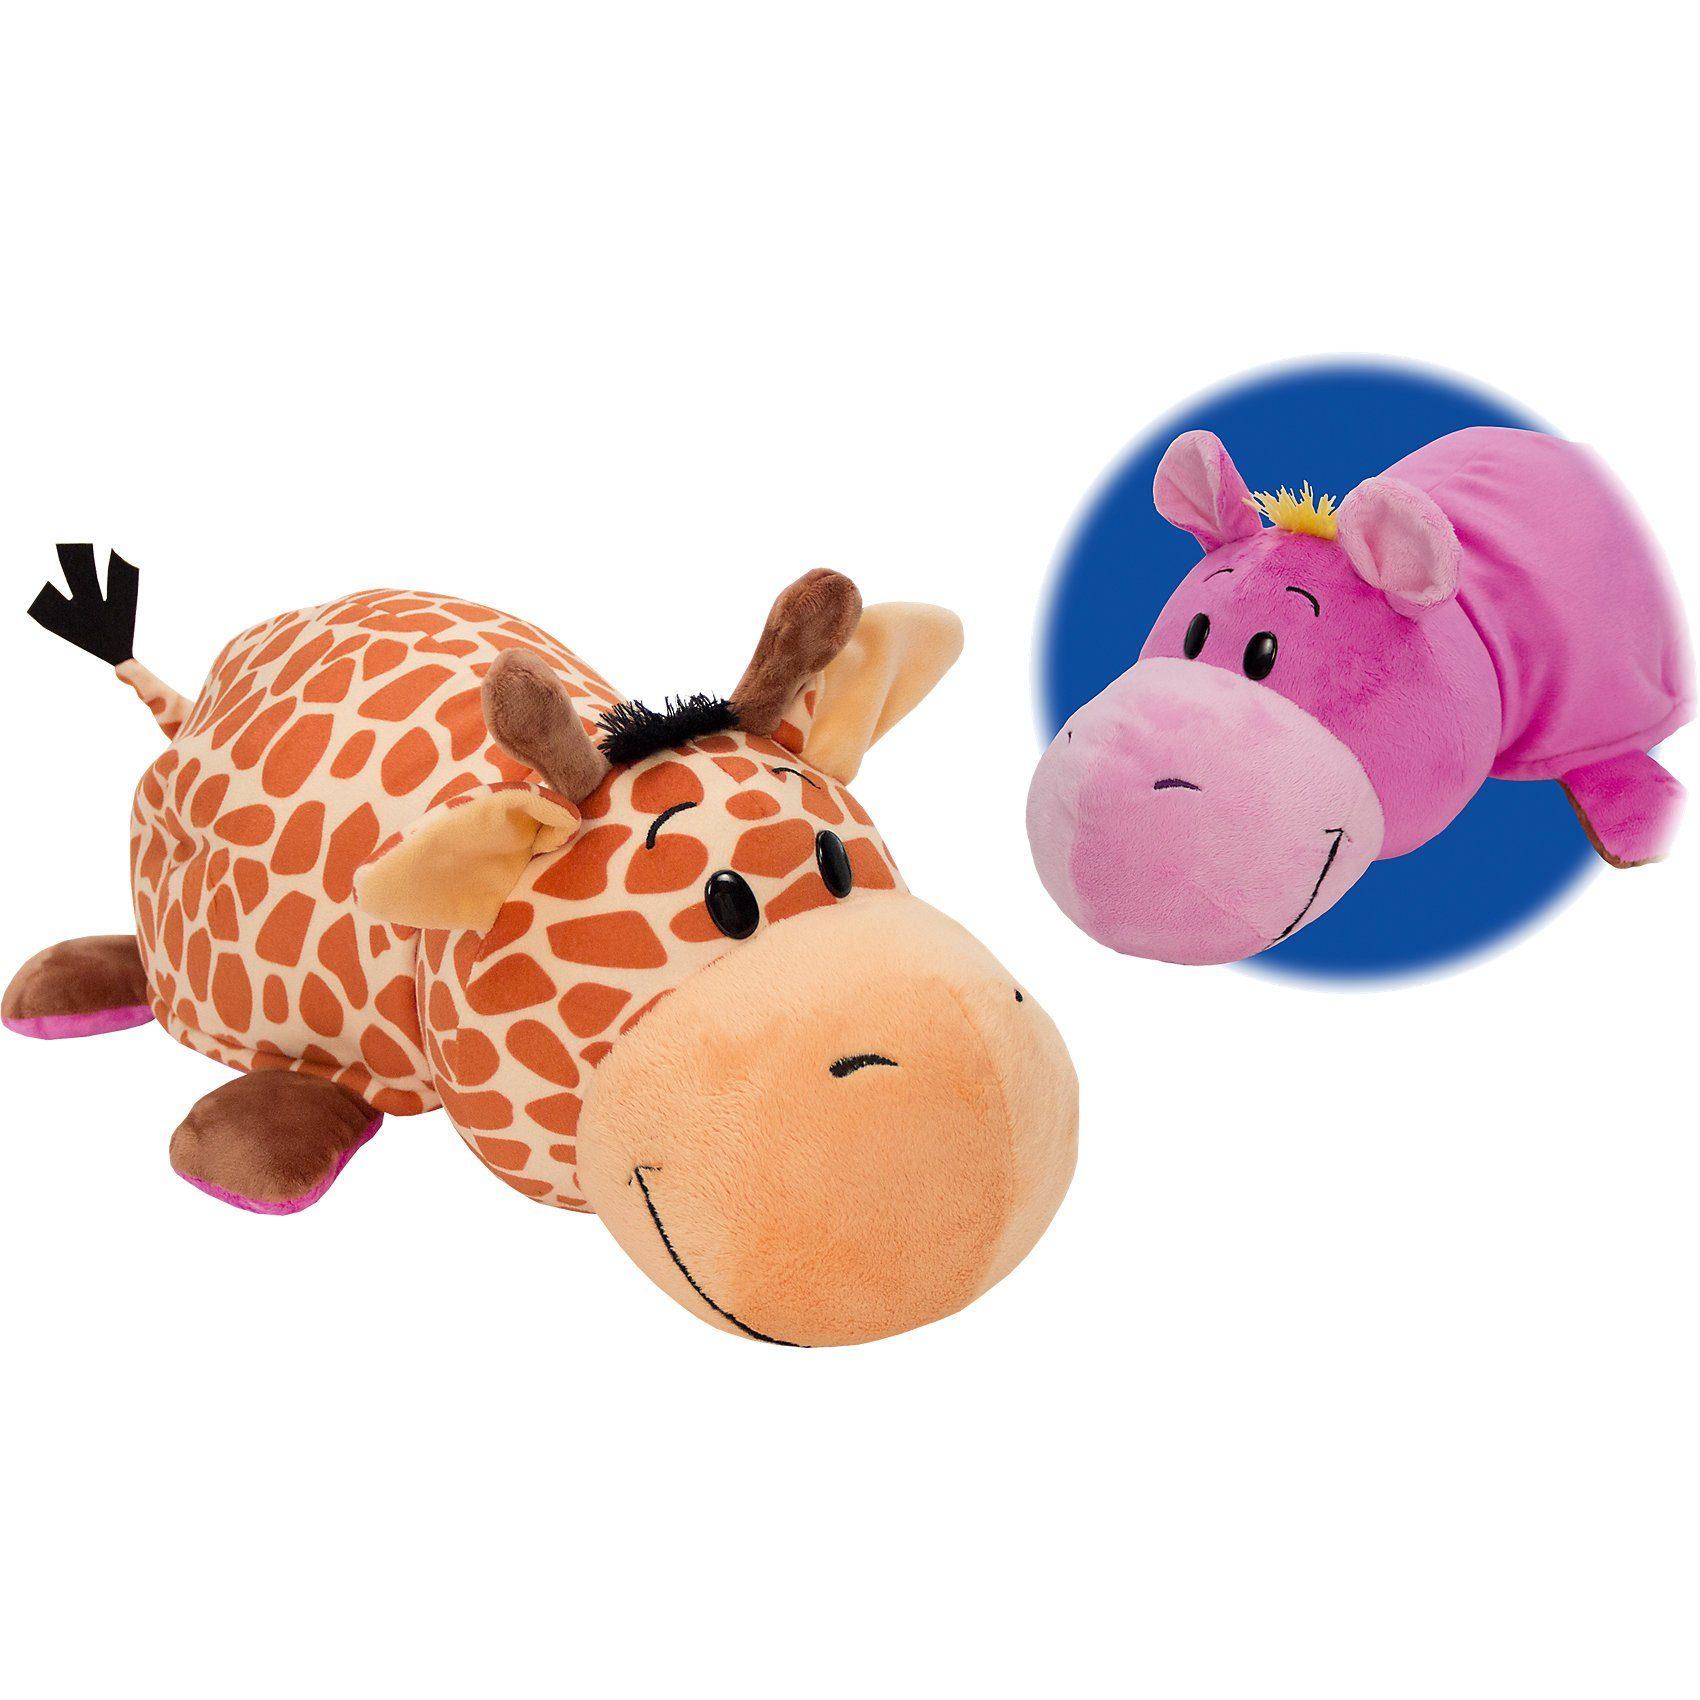 Vivid® Flip-a-Zoo Giraffe/Lila Tiger